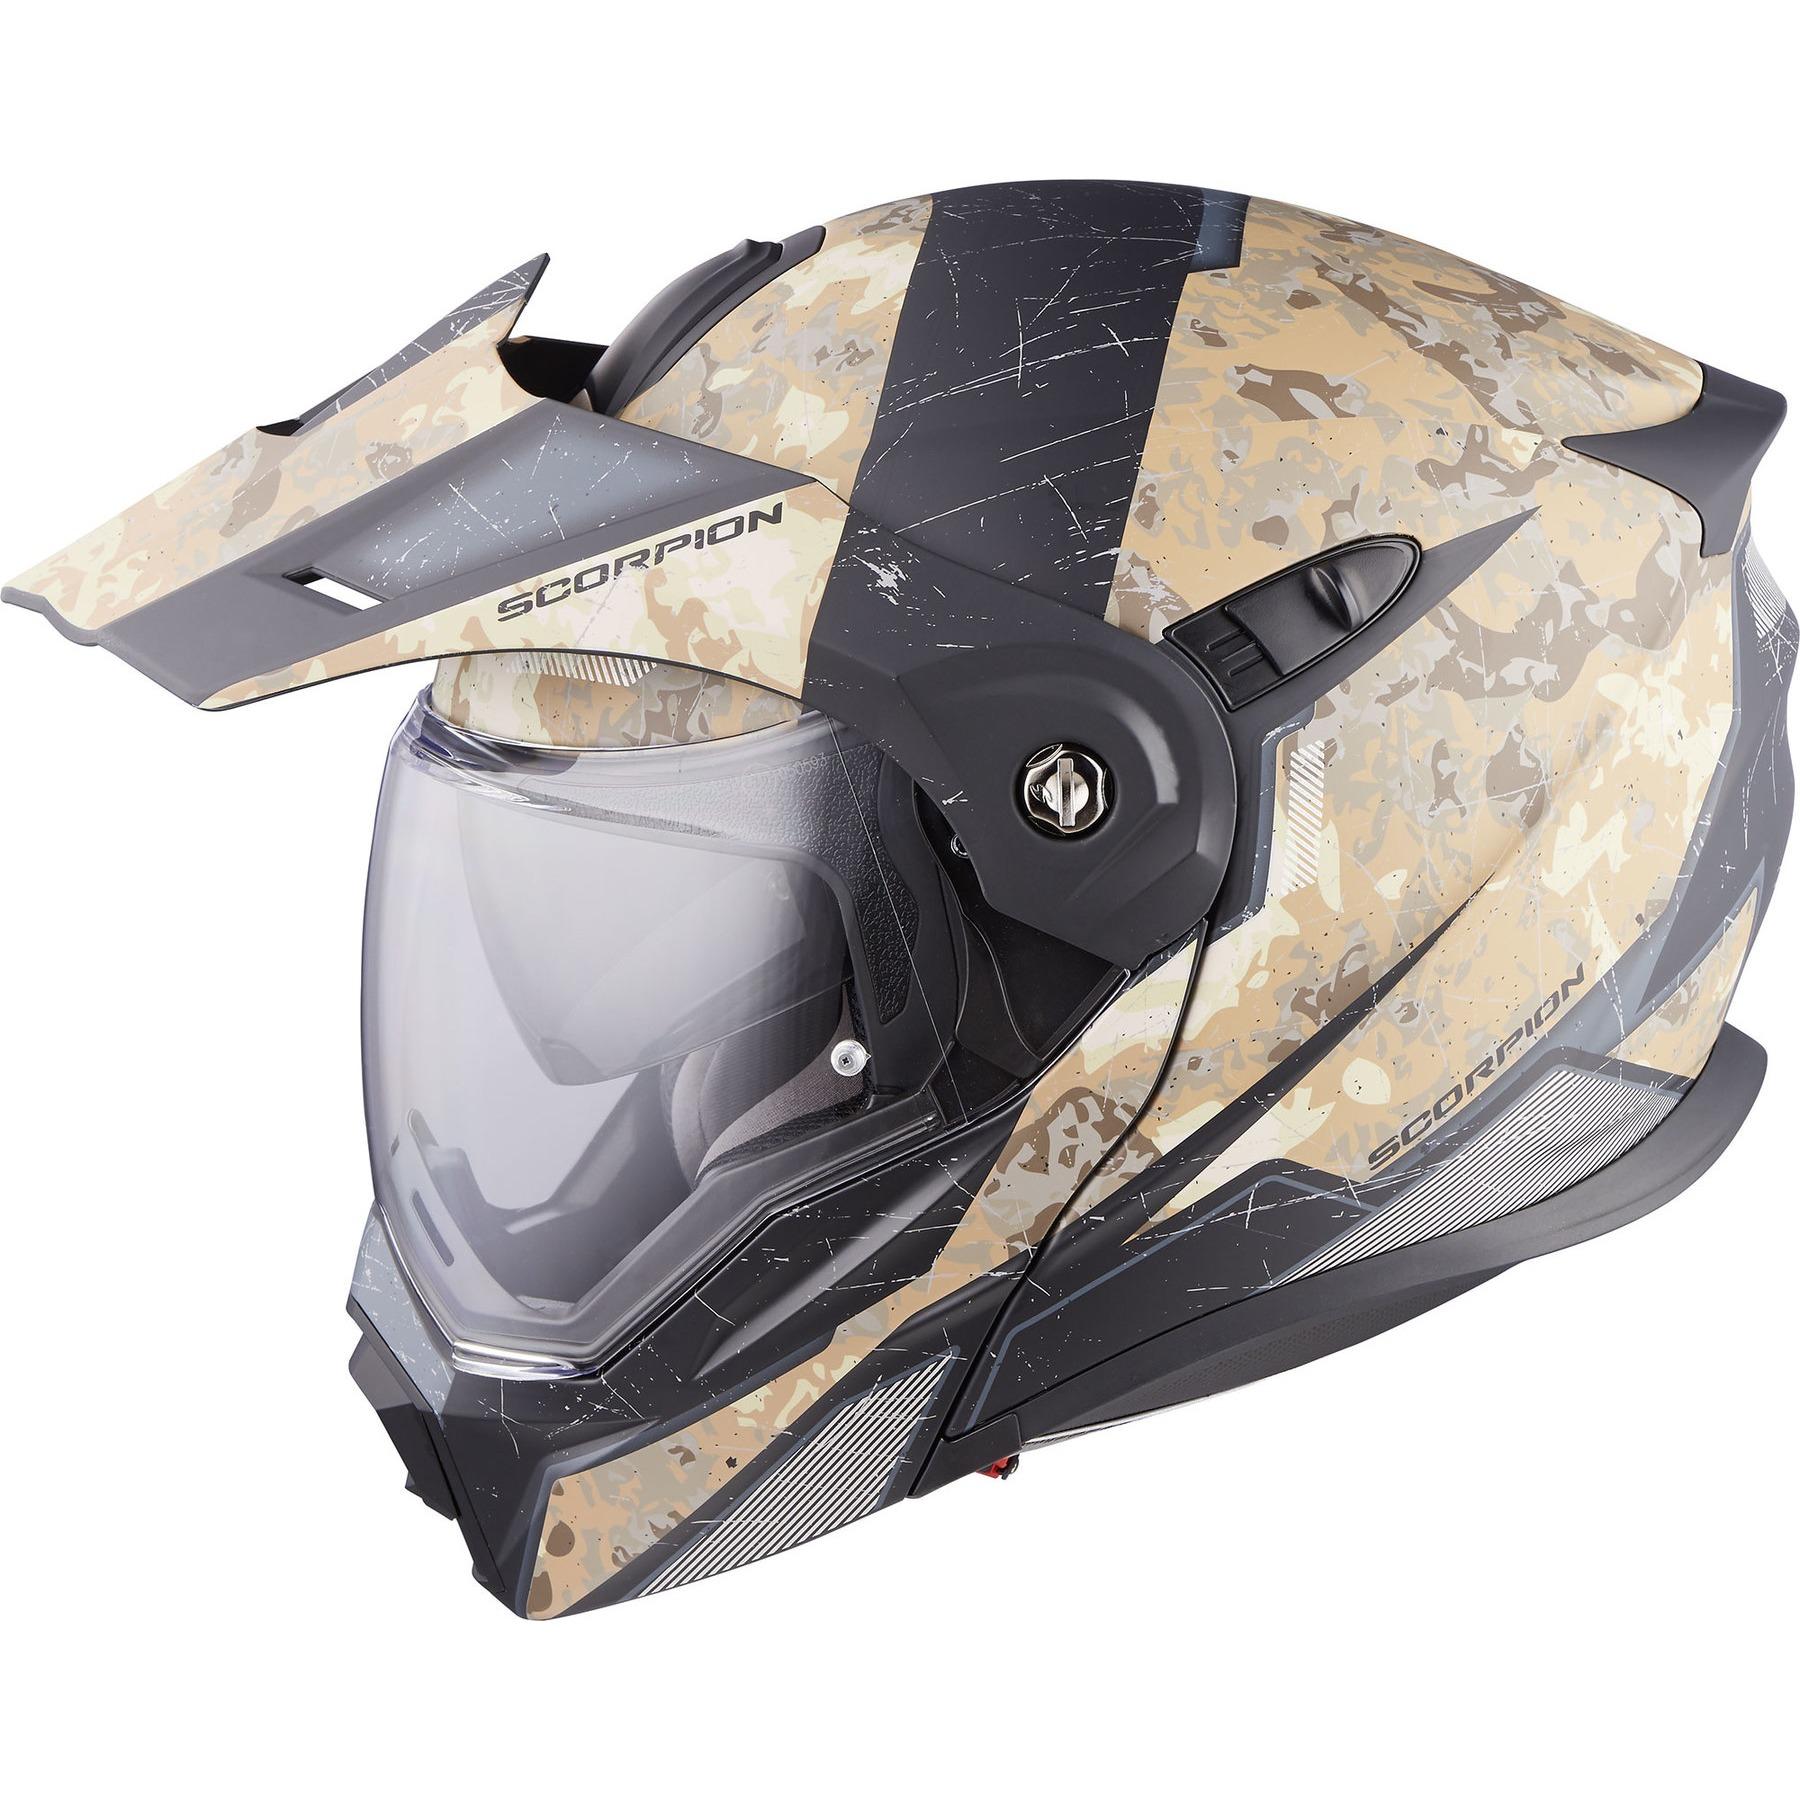 Matt Black Scorpion Casco Moto ADX-1 L